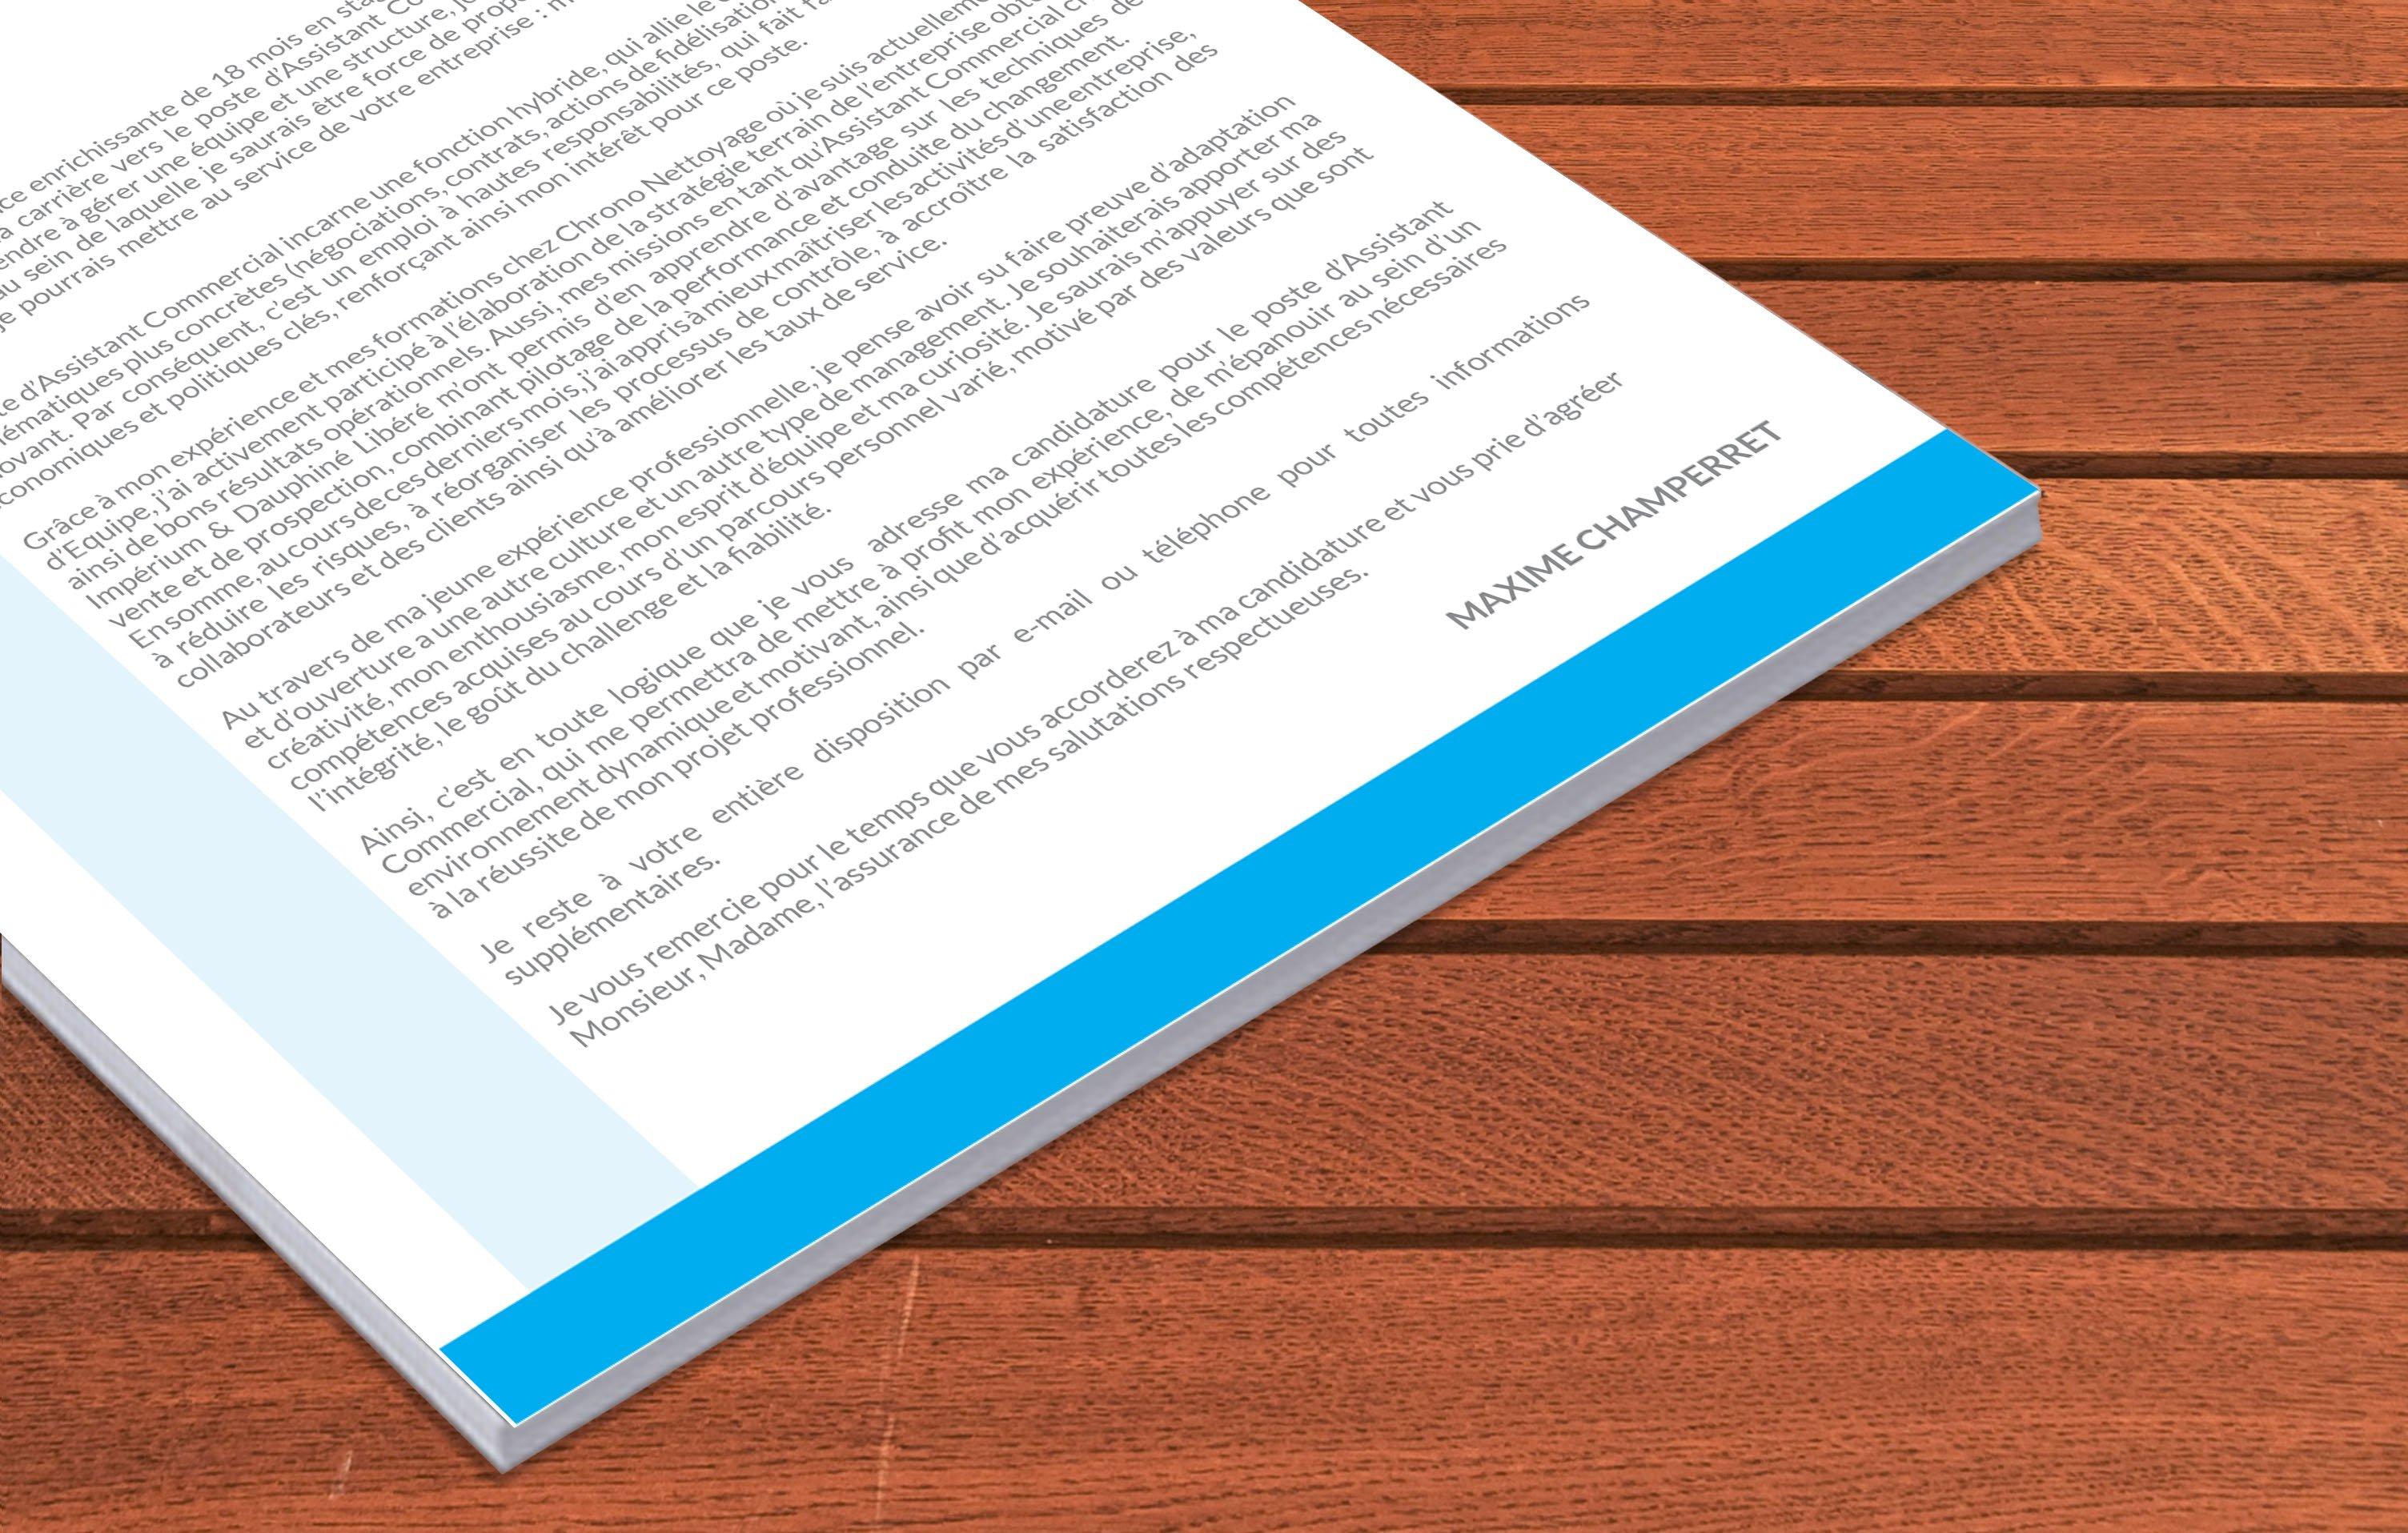 mycvfactory-cover-letter-l-océane-2_Dxazi4k.jpg